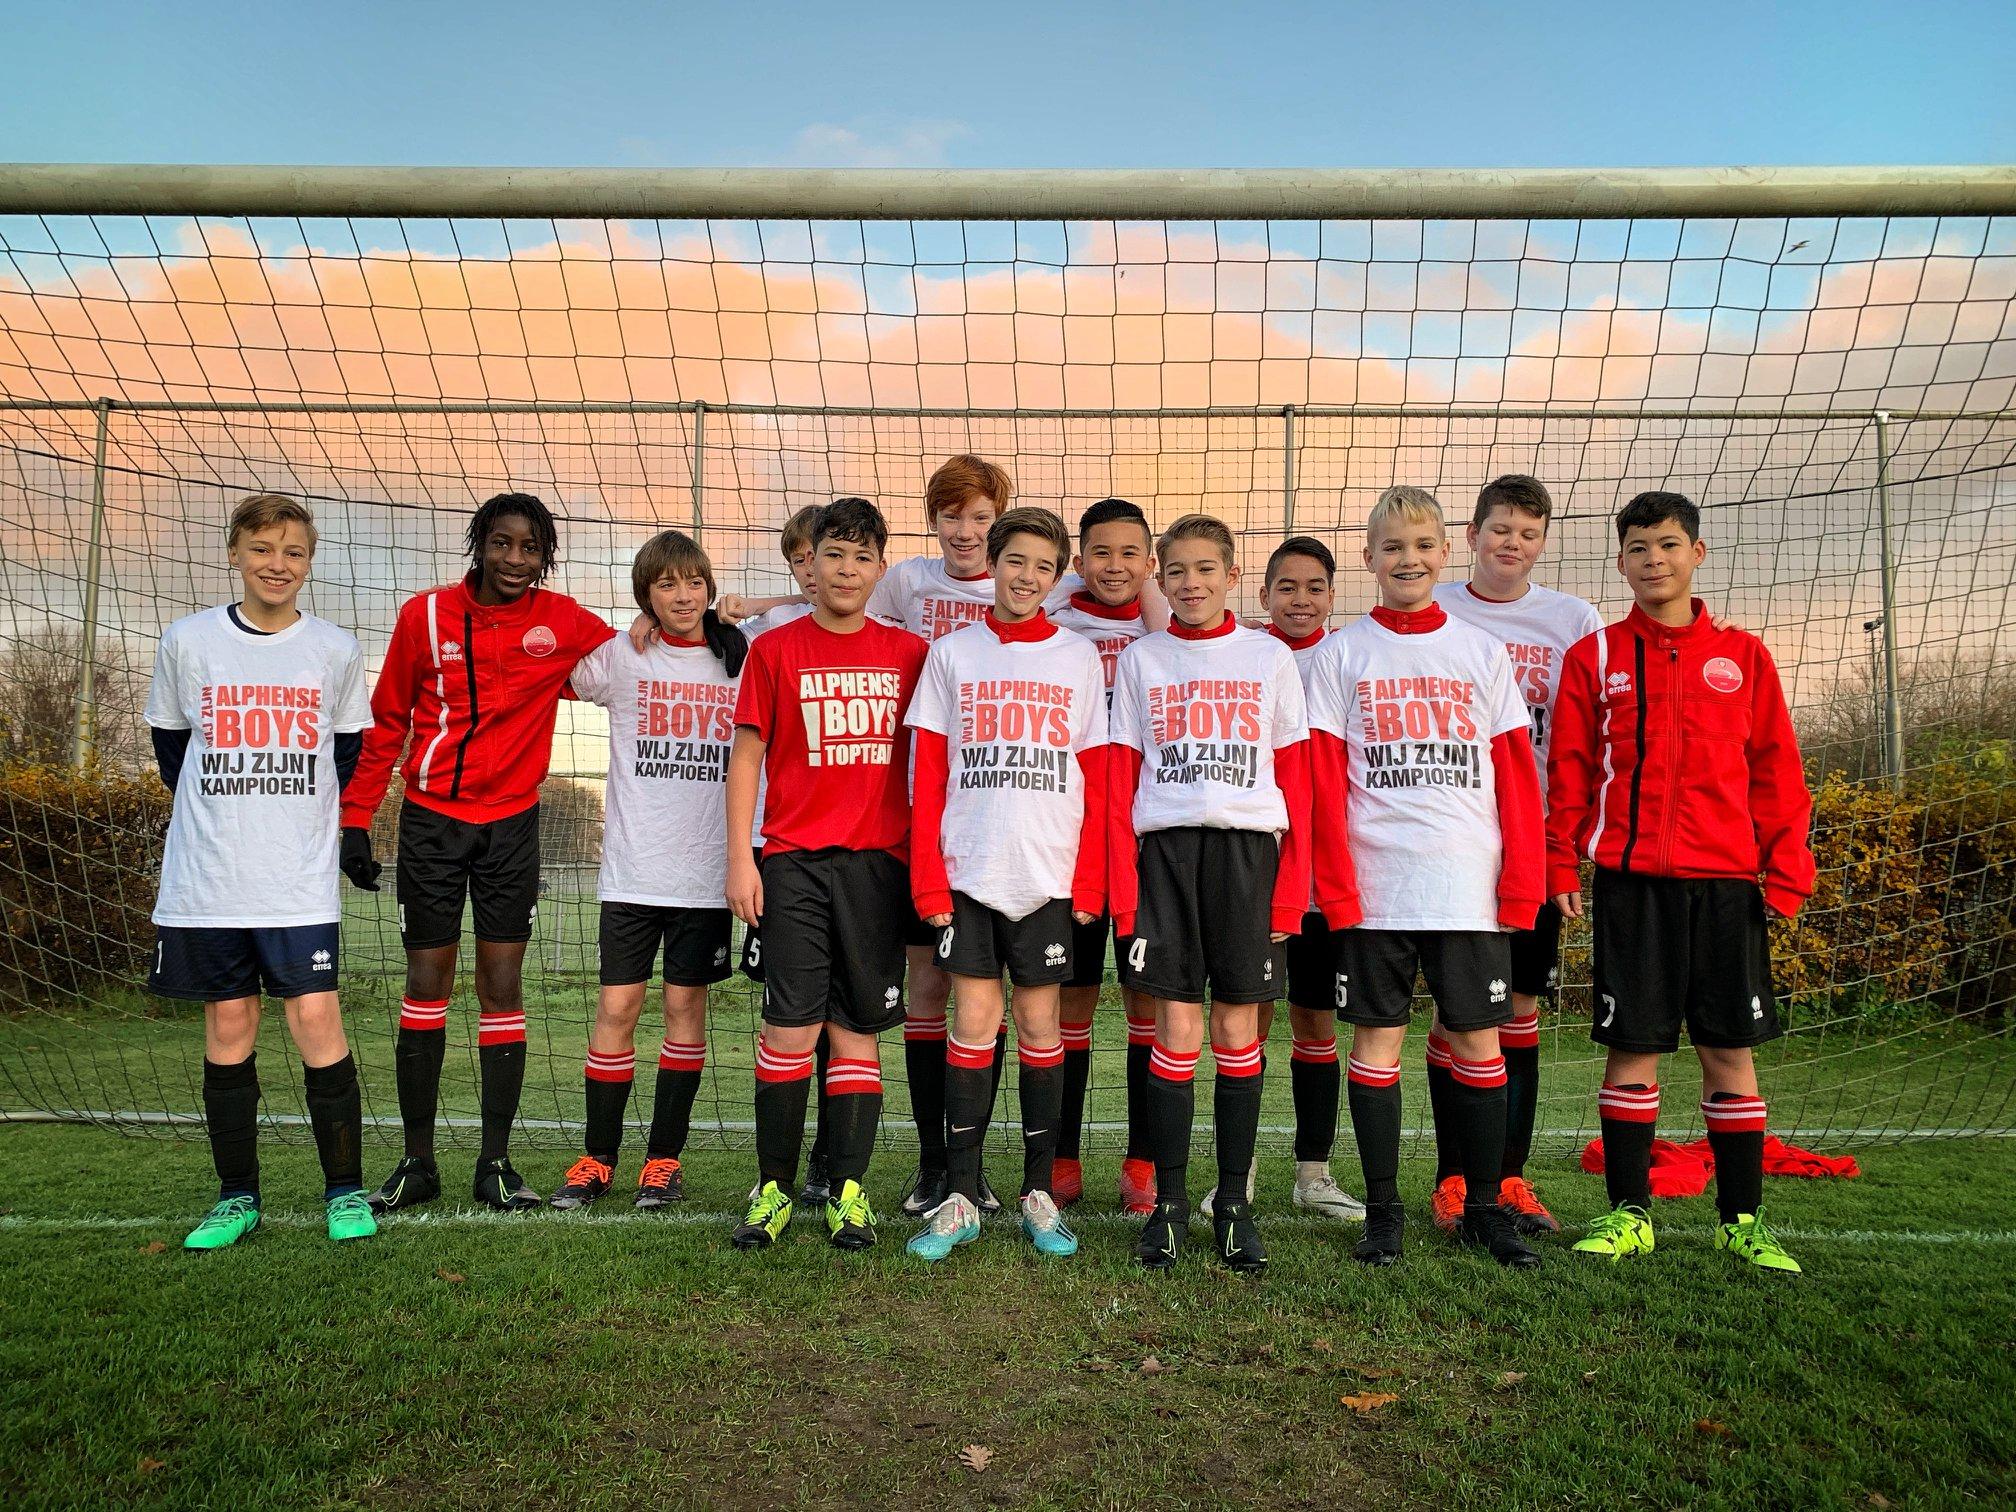 Alphense Boys JO14-3 weer kampioen!